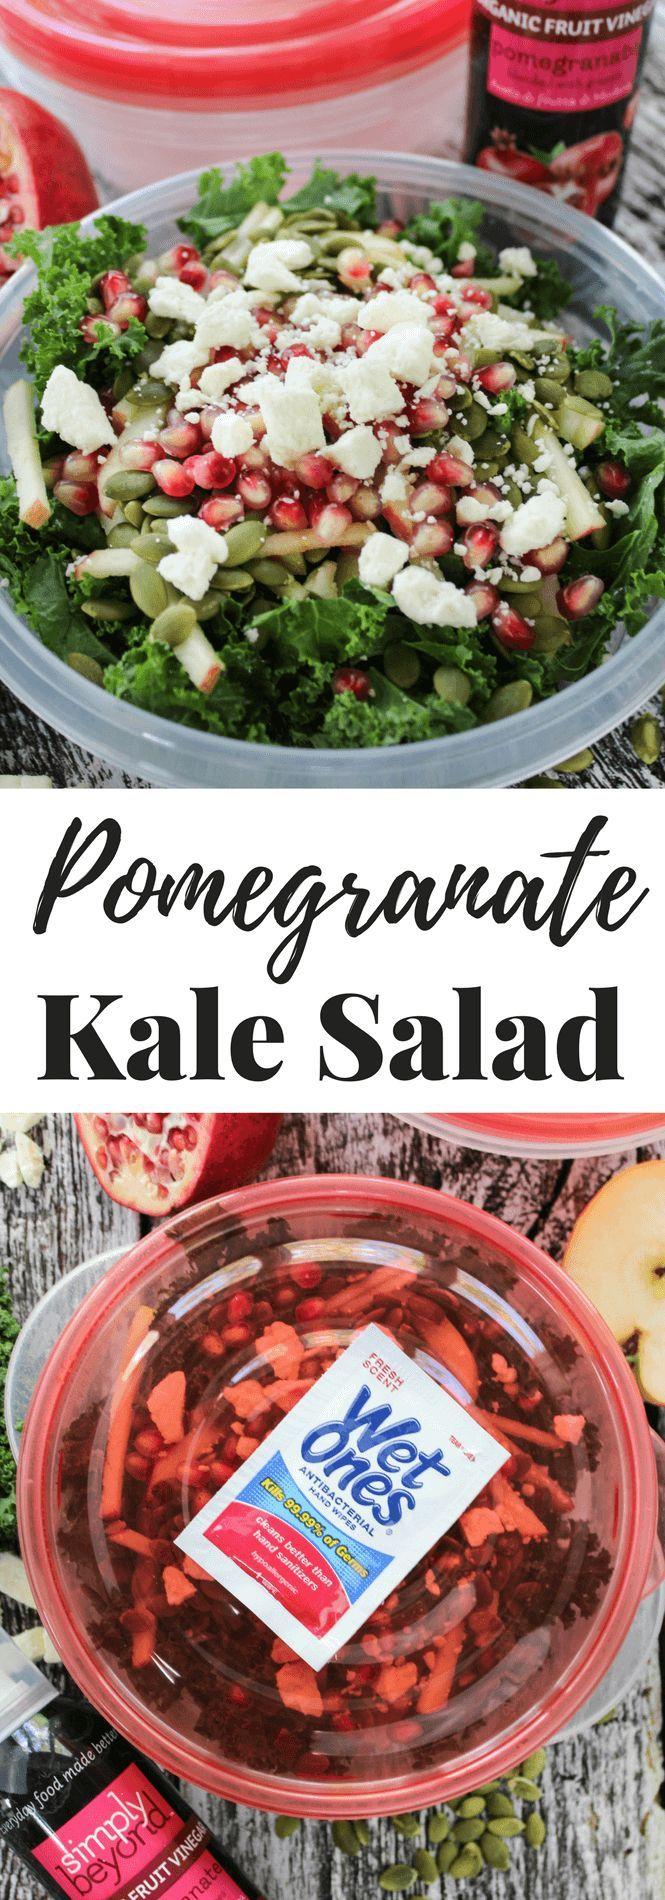 #sp Pomegranate Kale Salad #InstantMealsBx #wishihadawetones